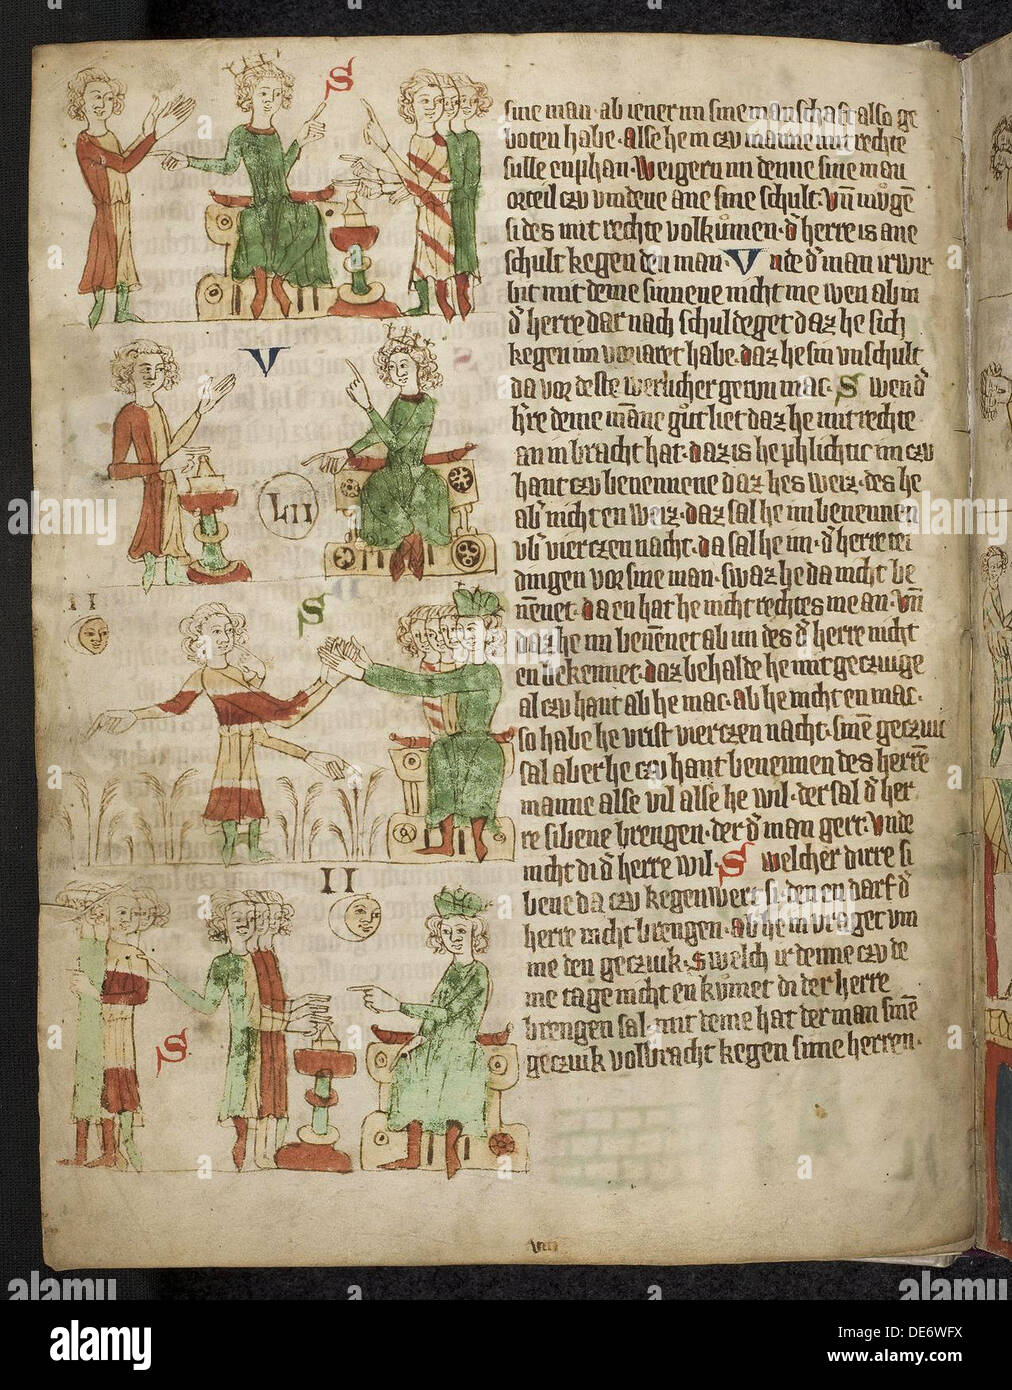 Feudal Law. Fom the Heidelberg Sachsenspiegel, 14th century. Artist: Eike von Repgow (1180/90-after 1233) - Stock Image